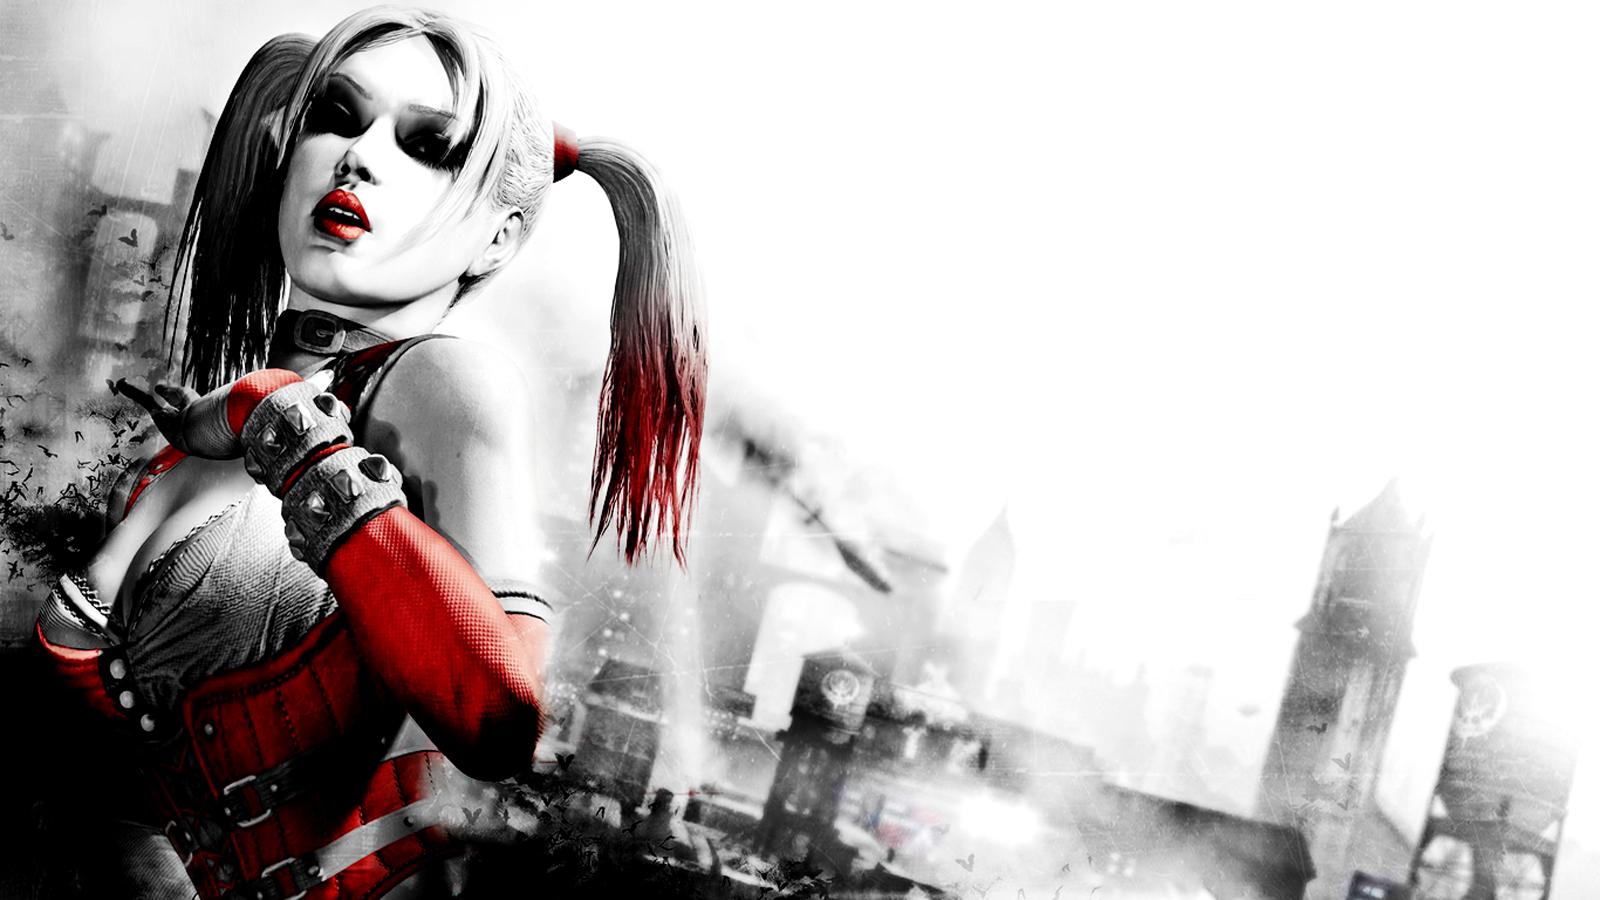 Quinn hd harley 116+ Harley